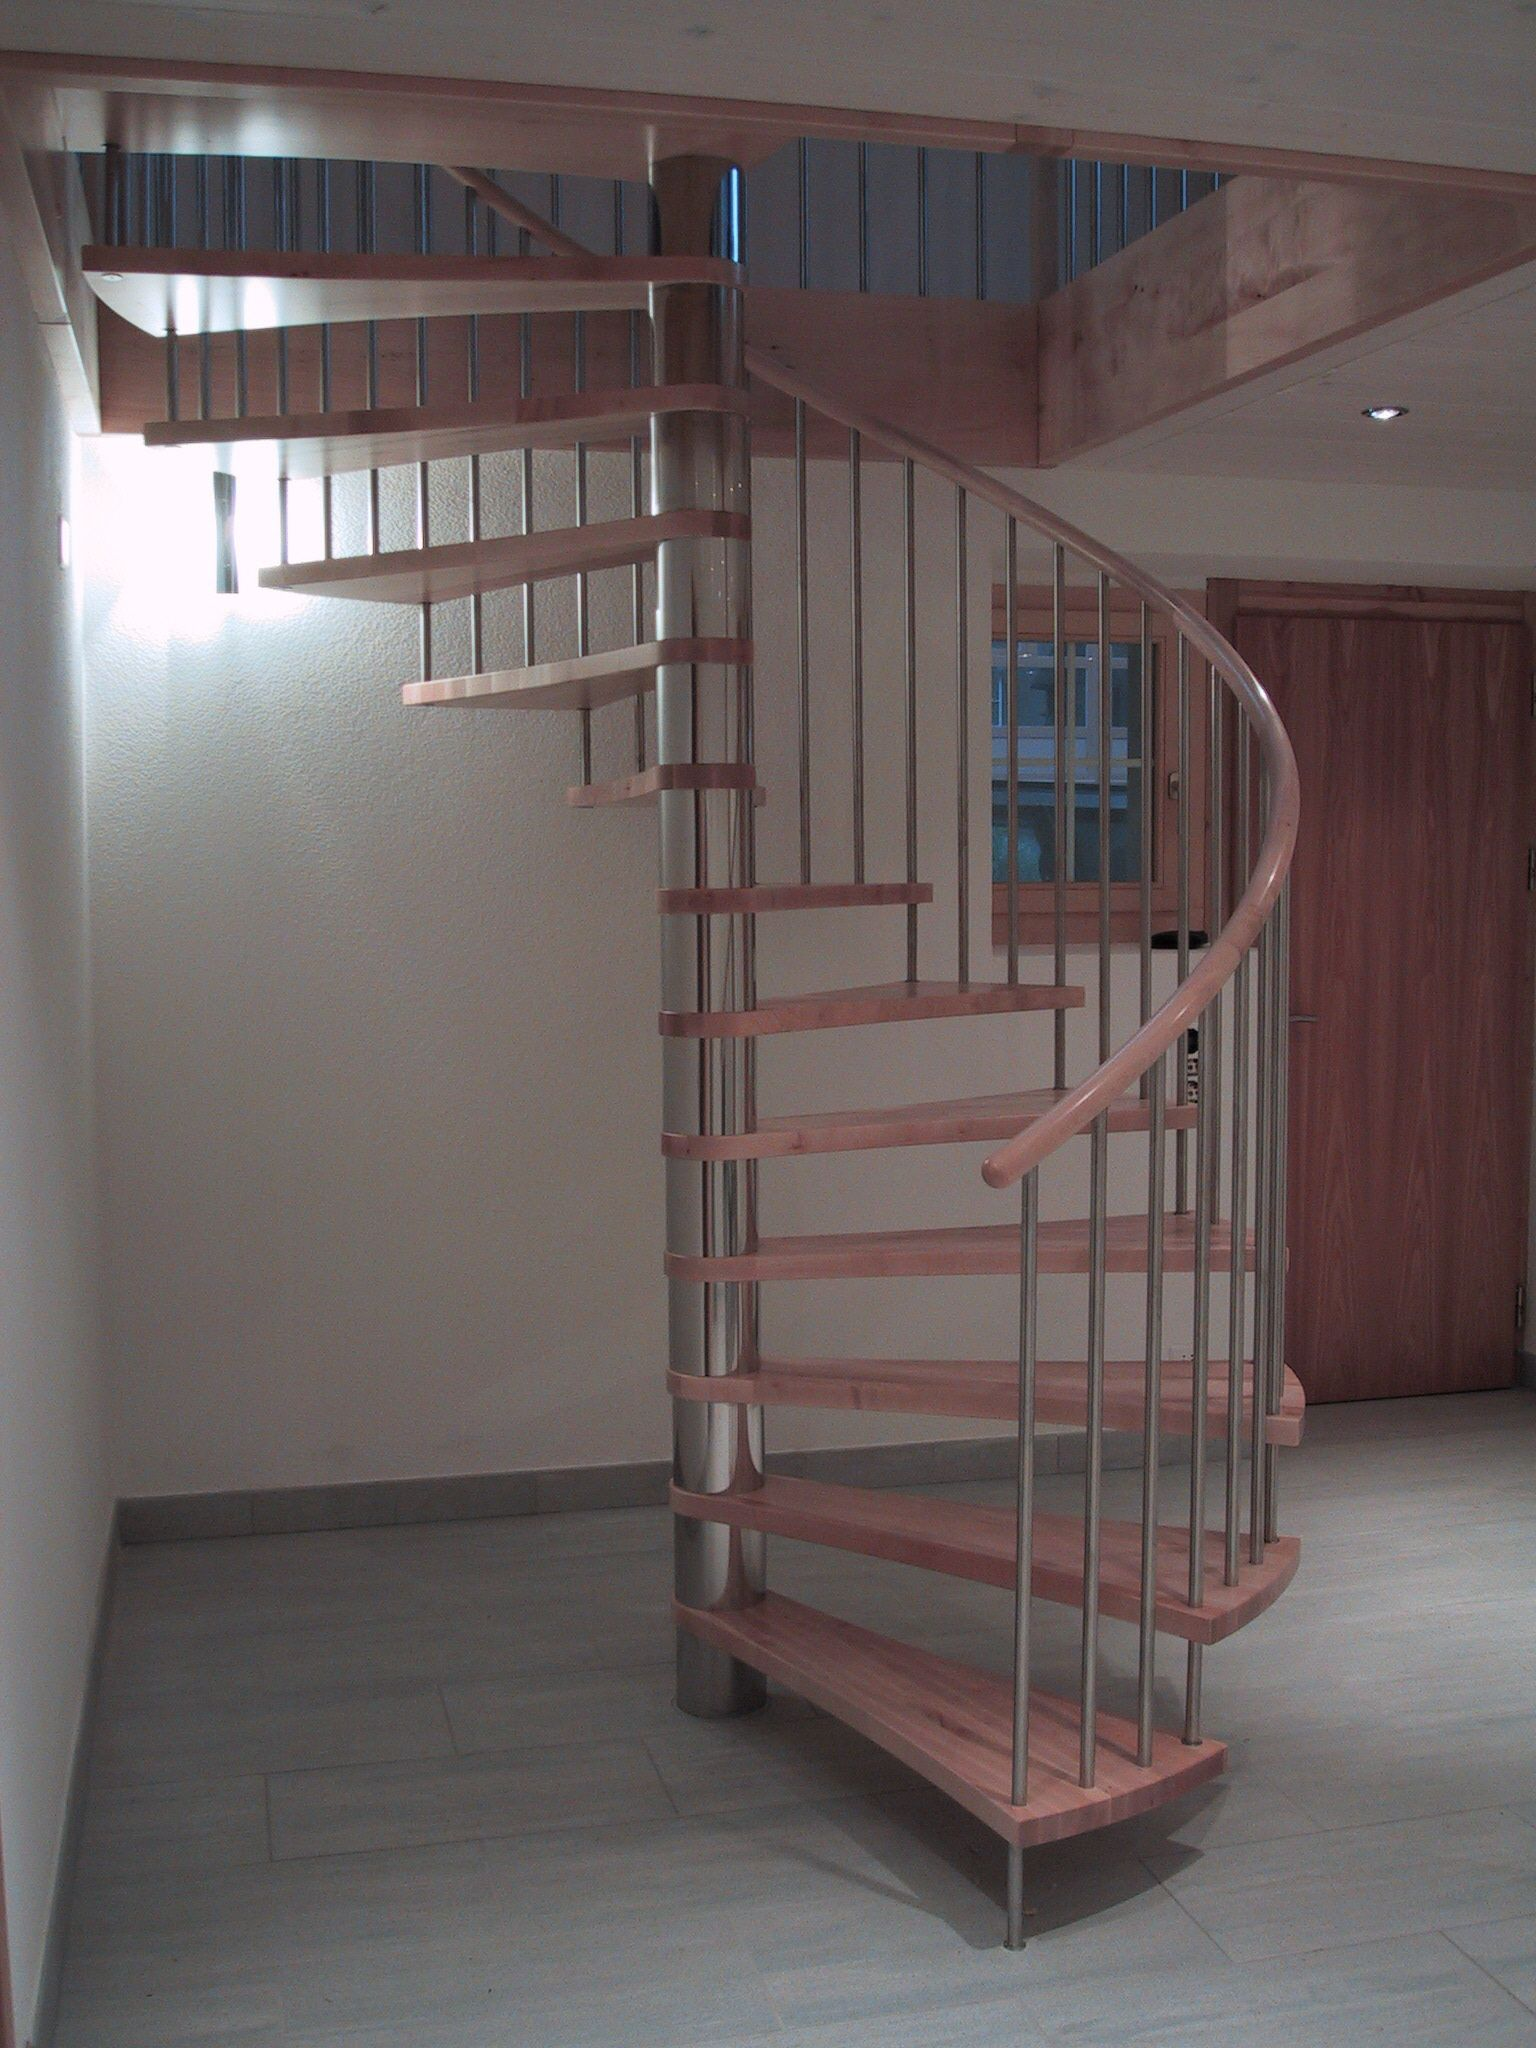 Stair Image 6